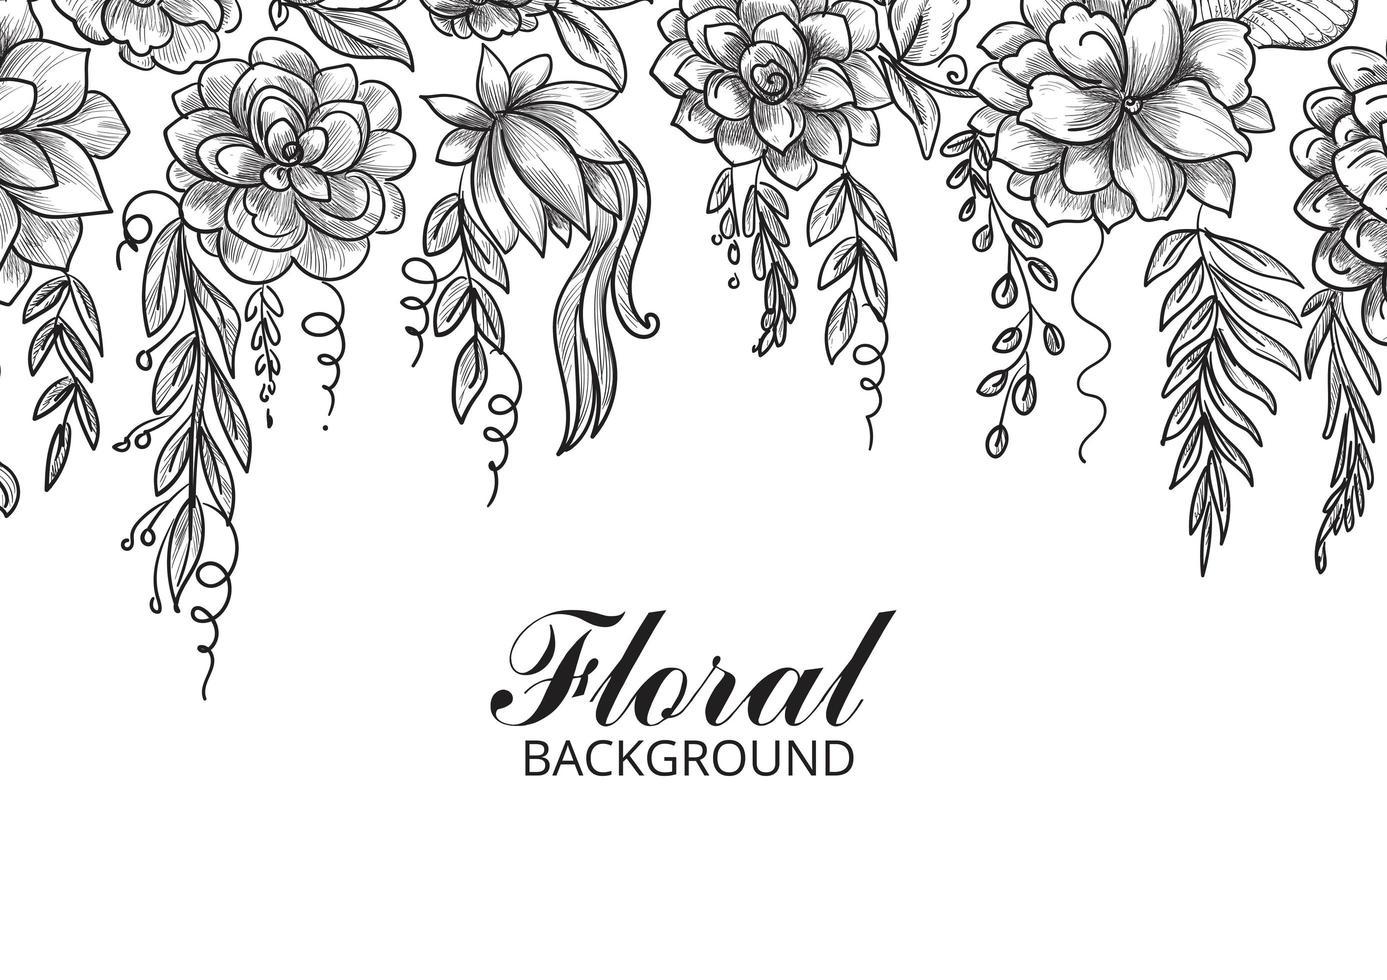 Fondo de dibujo floral decorativo ornamental vector